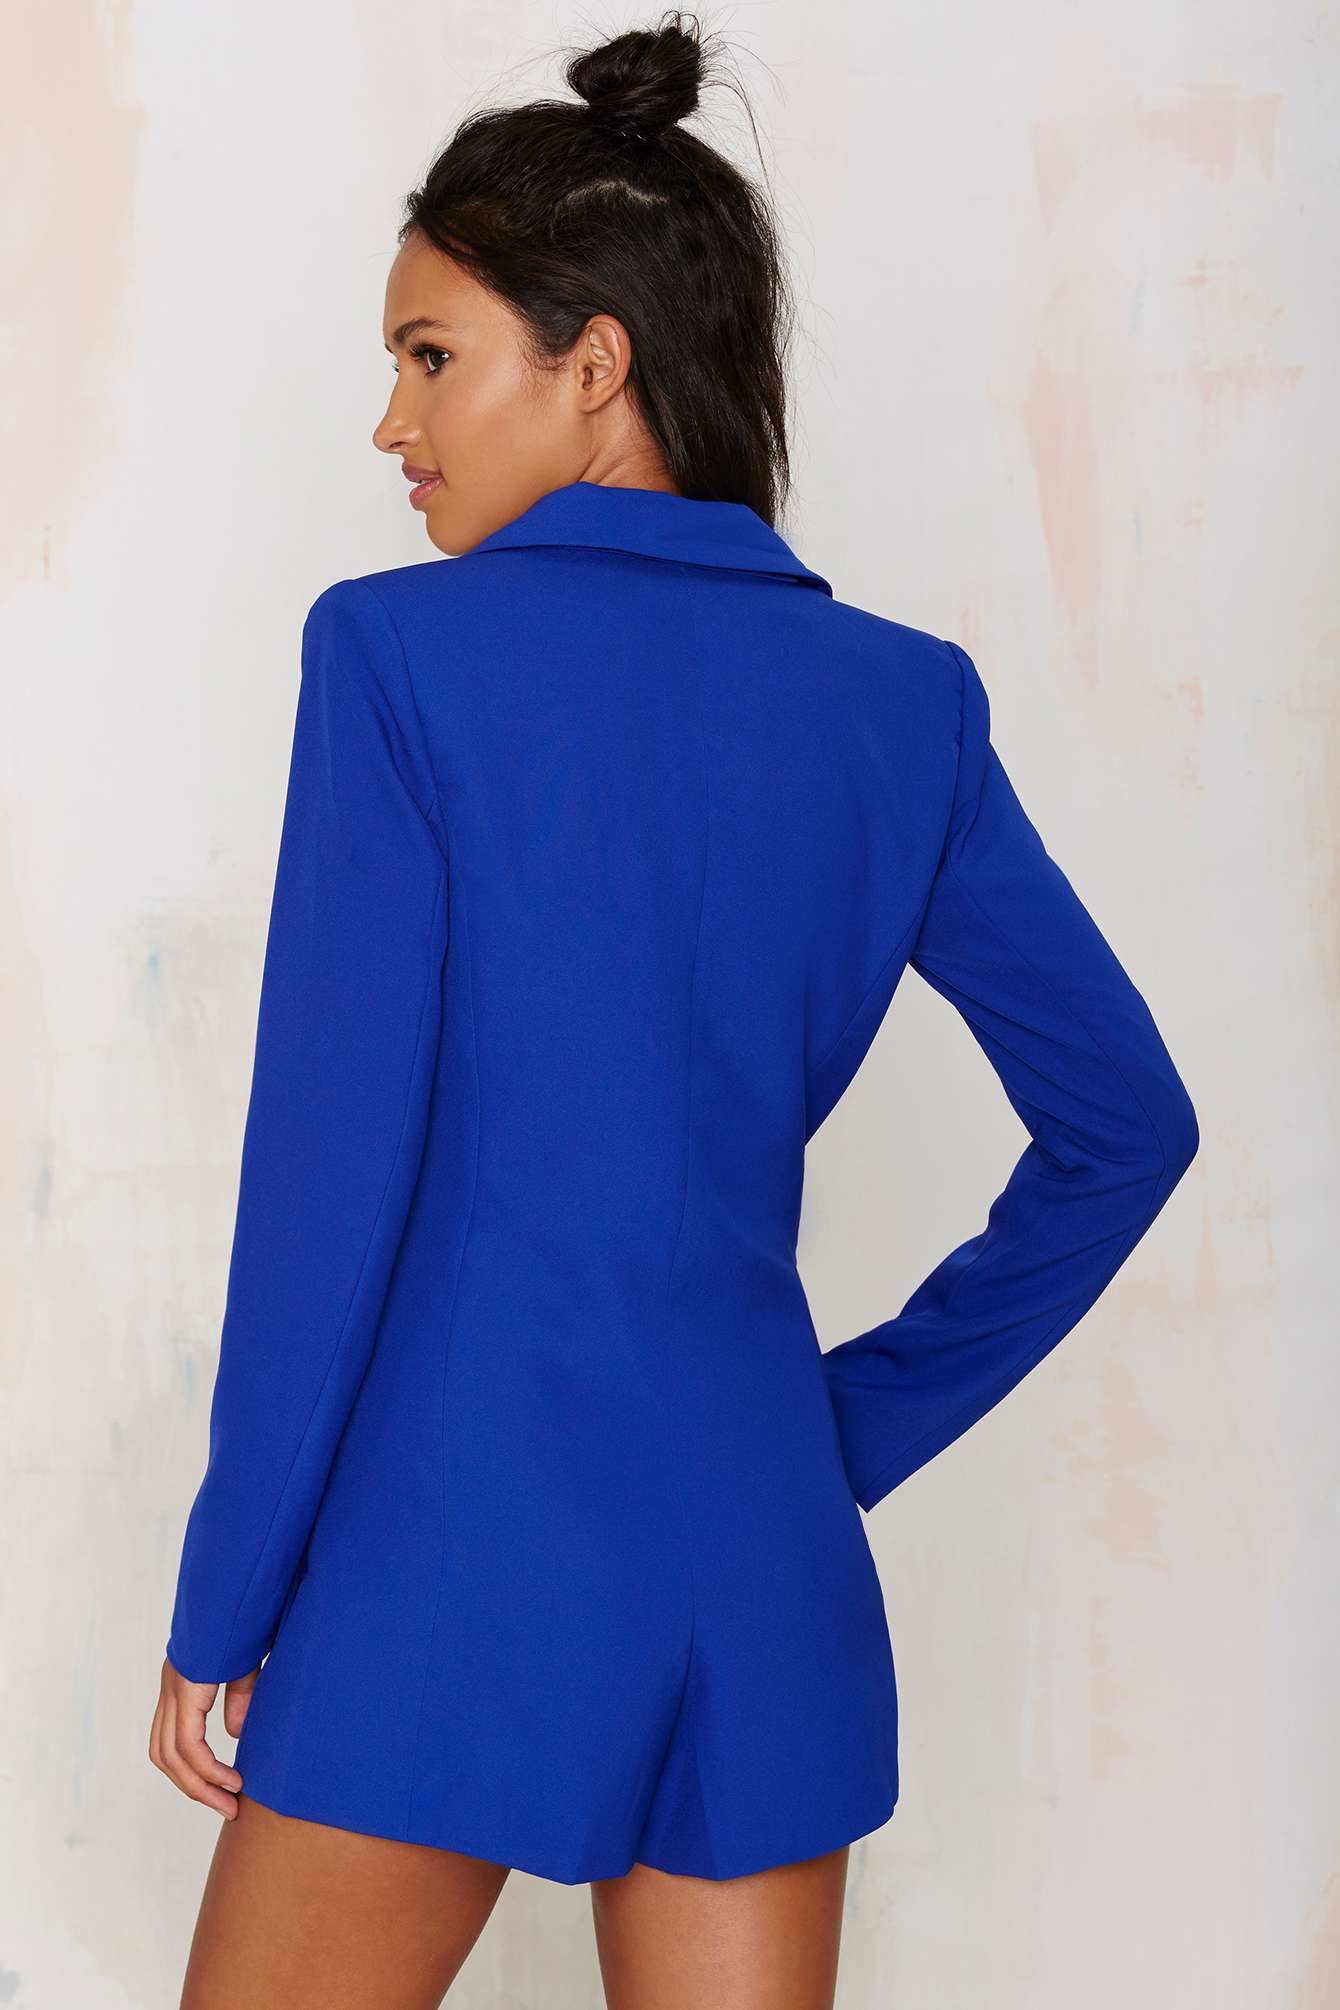 a33c73fda562 Lyst - Nasty Gal No Tux Given Blazer Romper - Blue in Blue